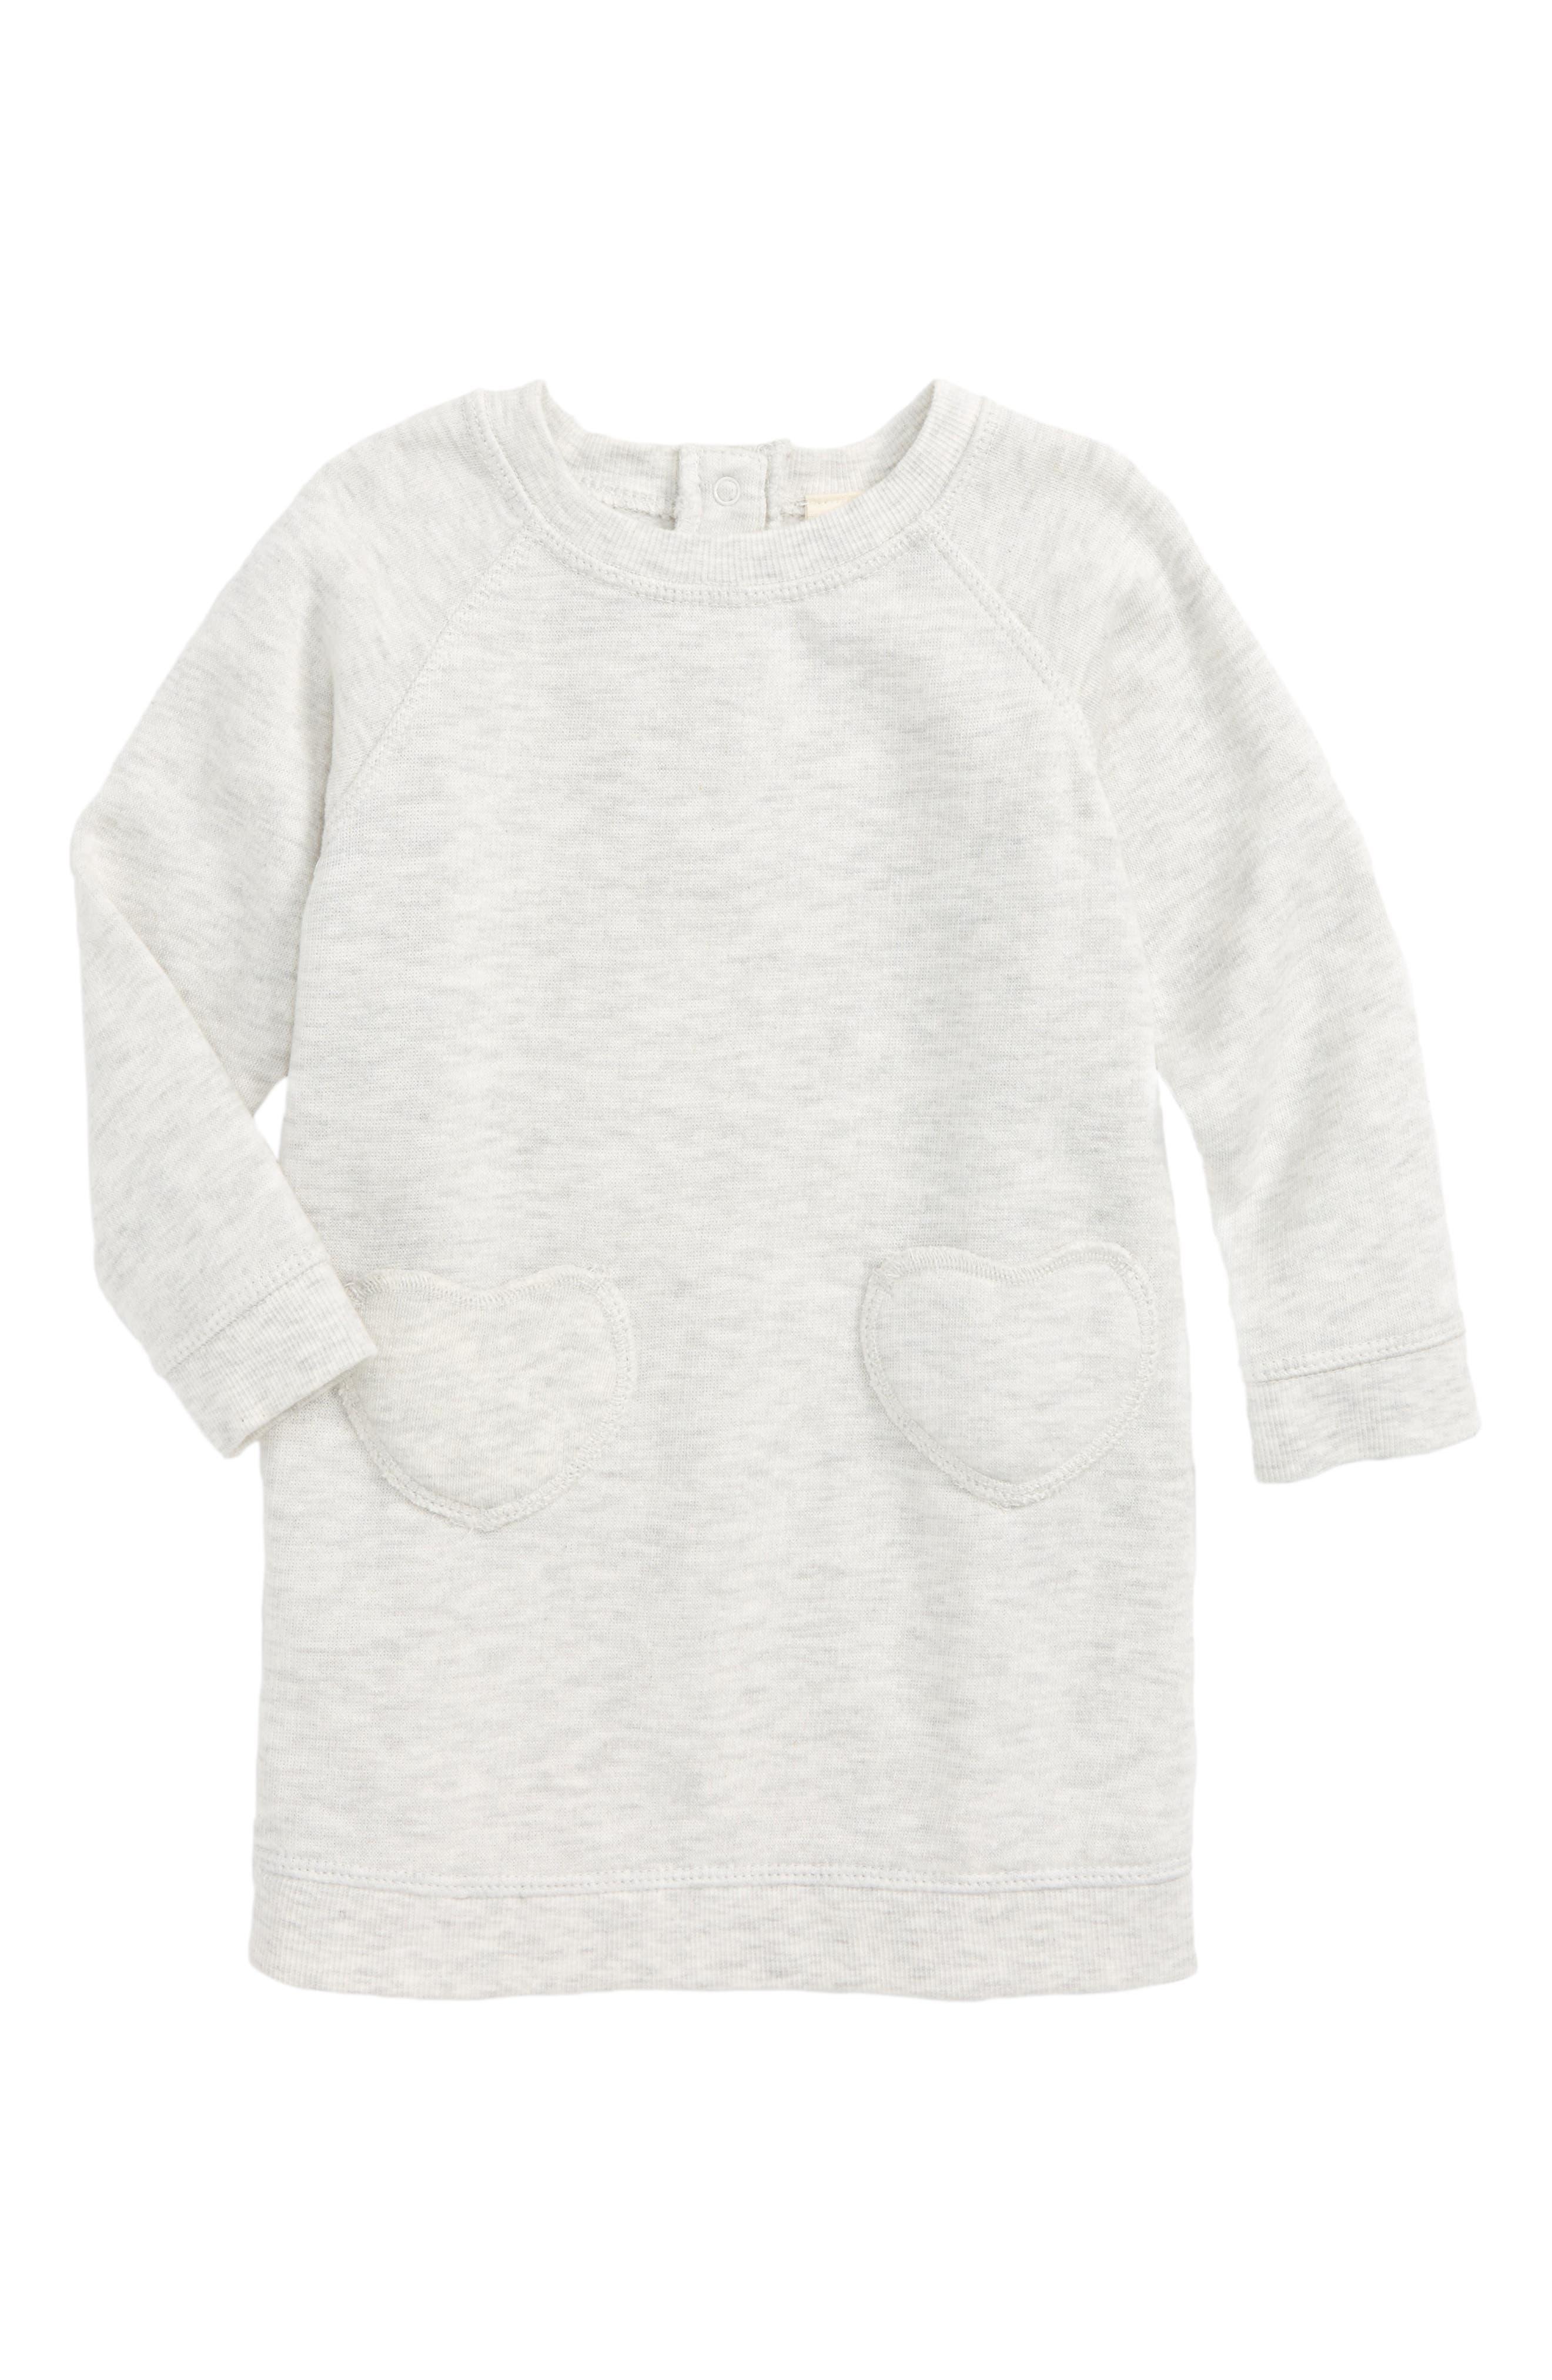 Alternate Image 1 Selected - Tucker + Tate Sweatshirt Dress (Baby Girls)